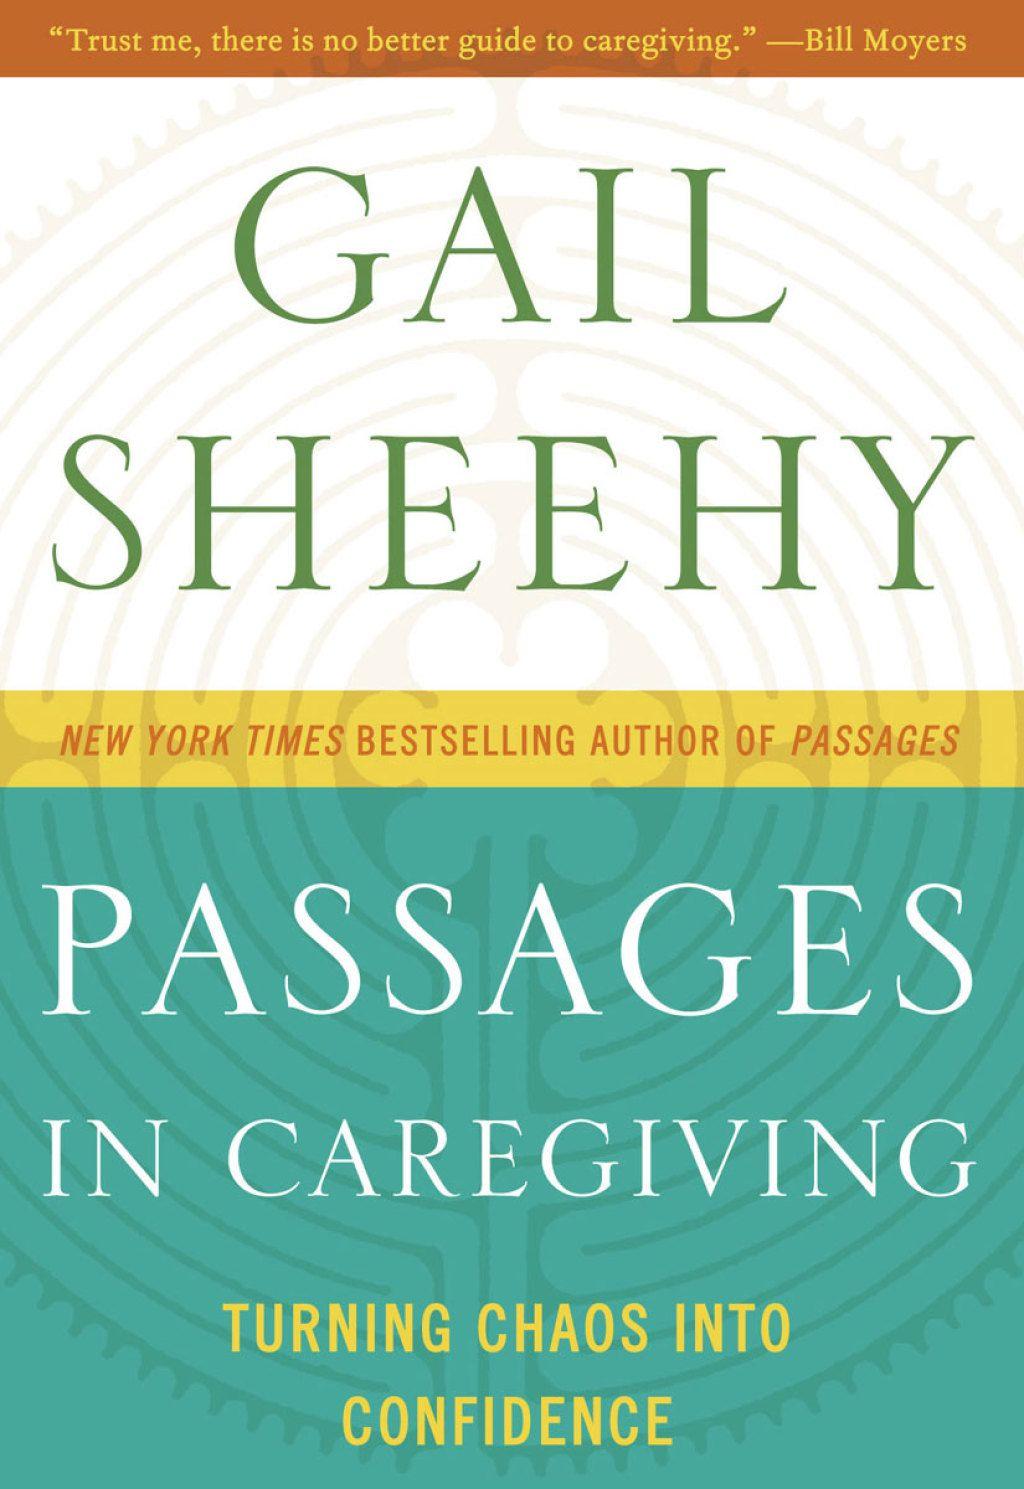 Passages in caregiving ebook caregiver alzheimers